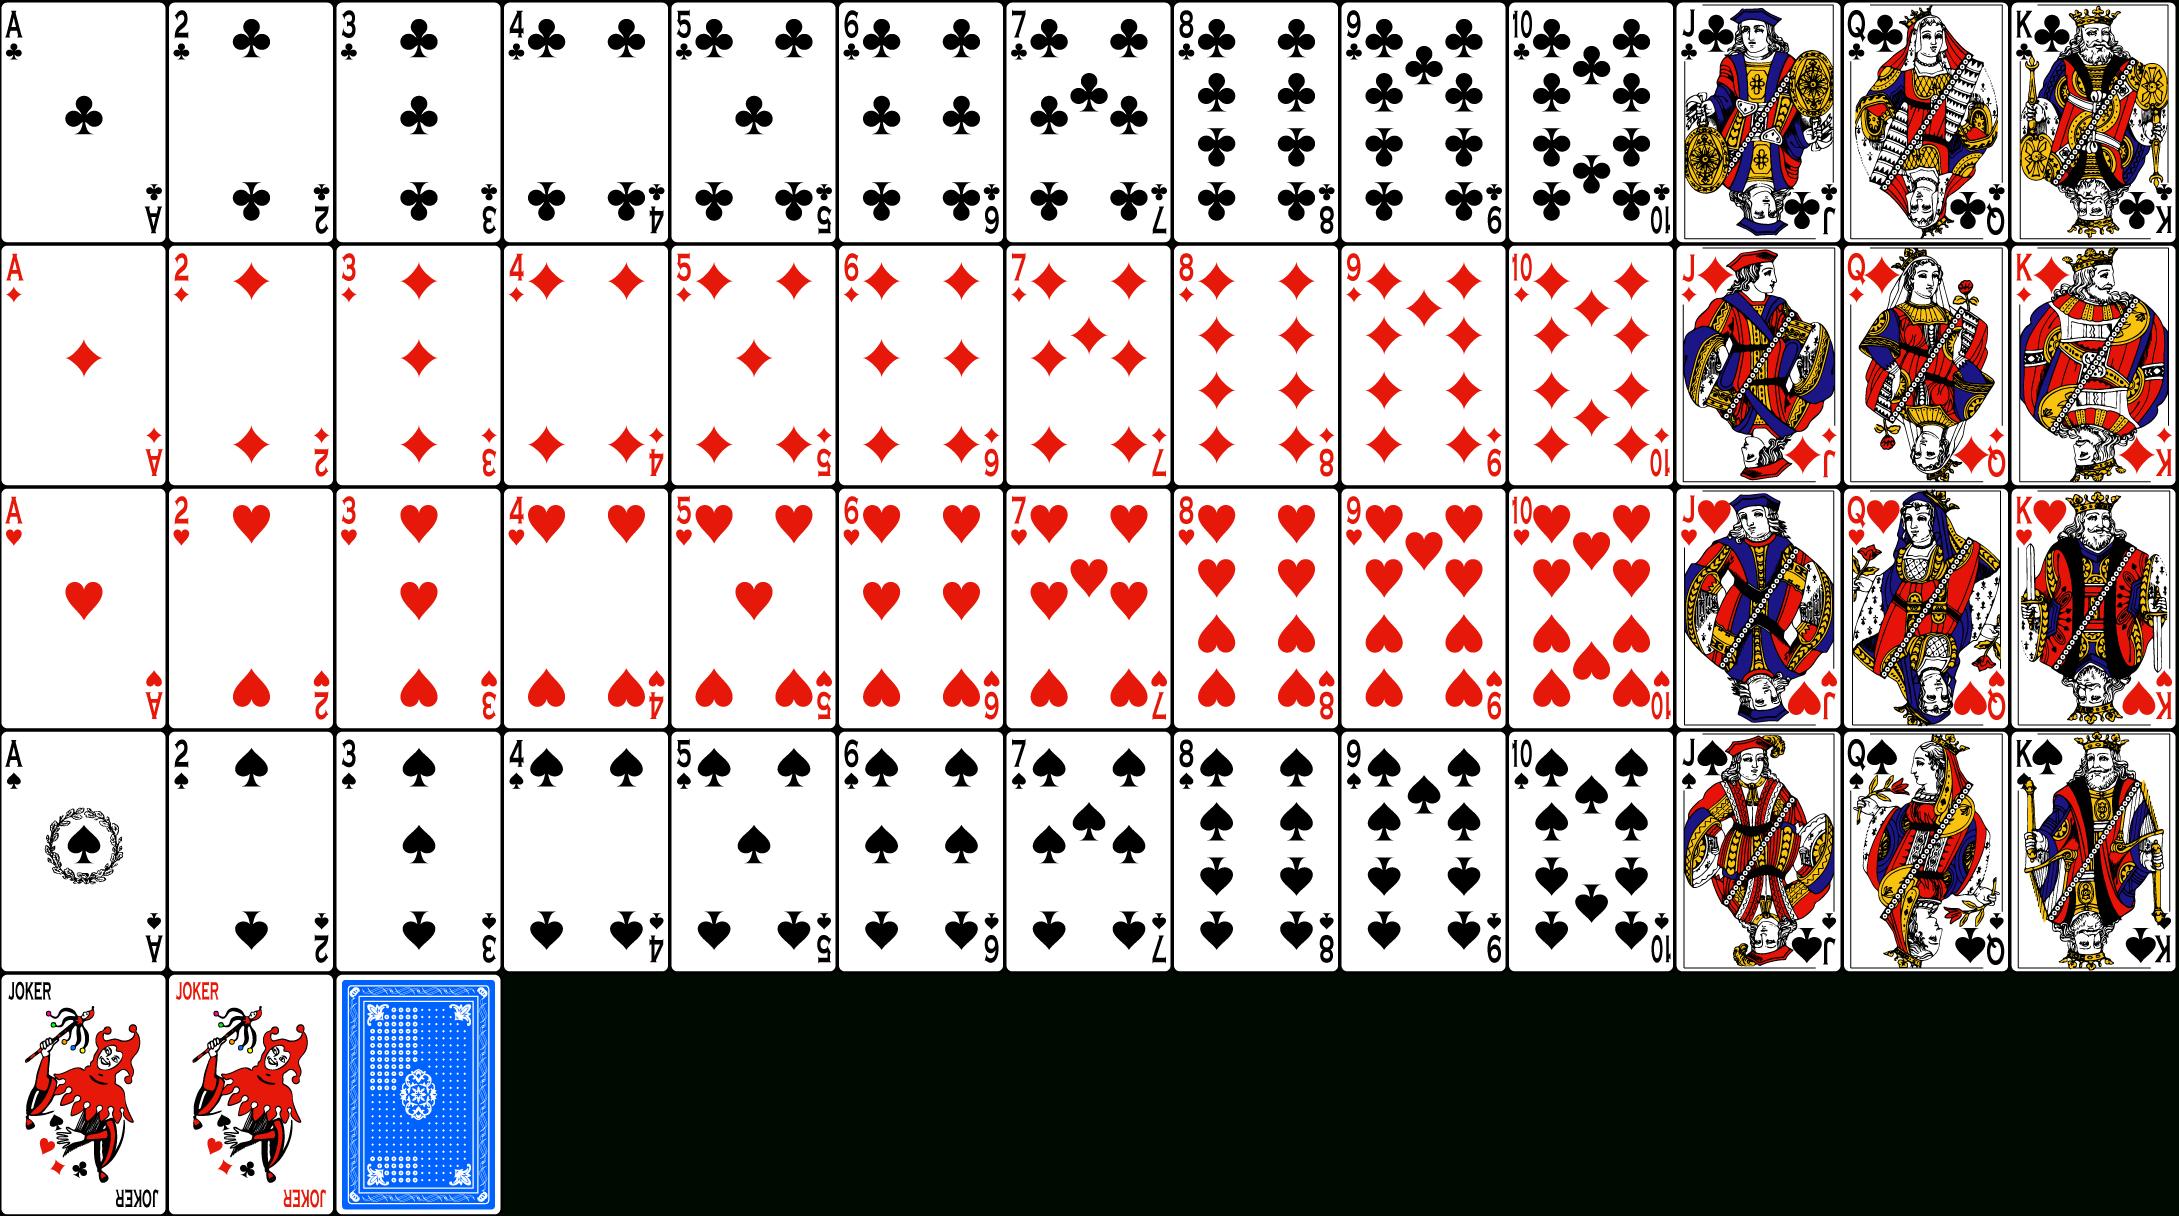 018 Deck Of Cards Template ~ Ulyssesroom - Free Printable Deck Of Cards